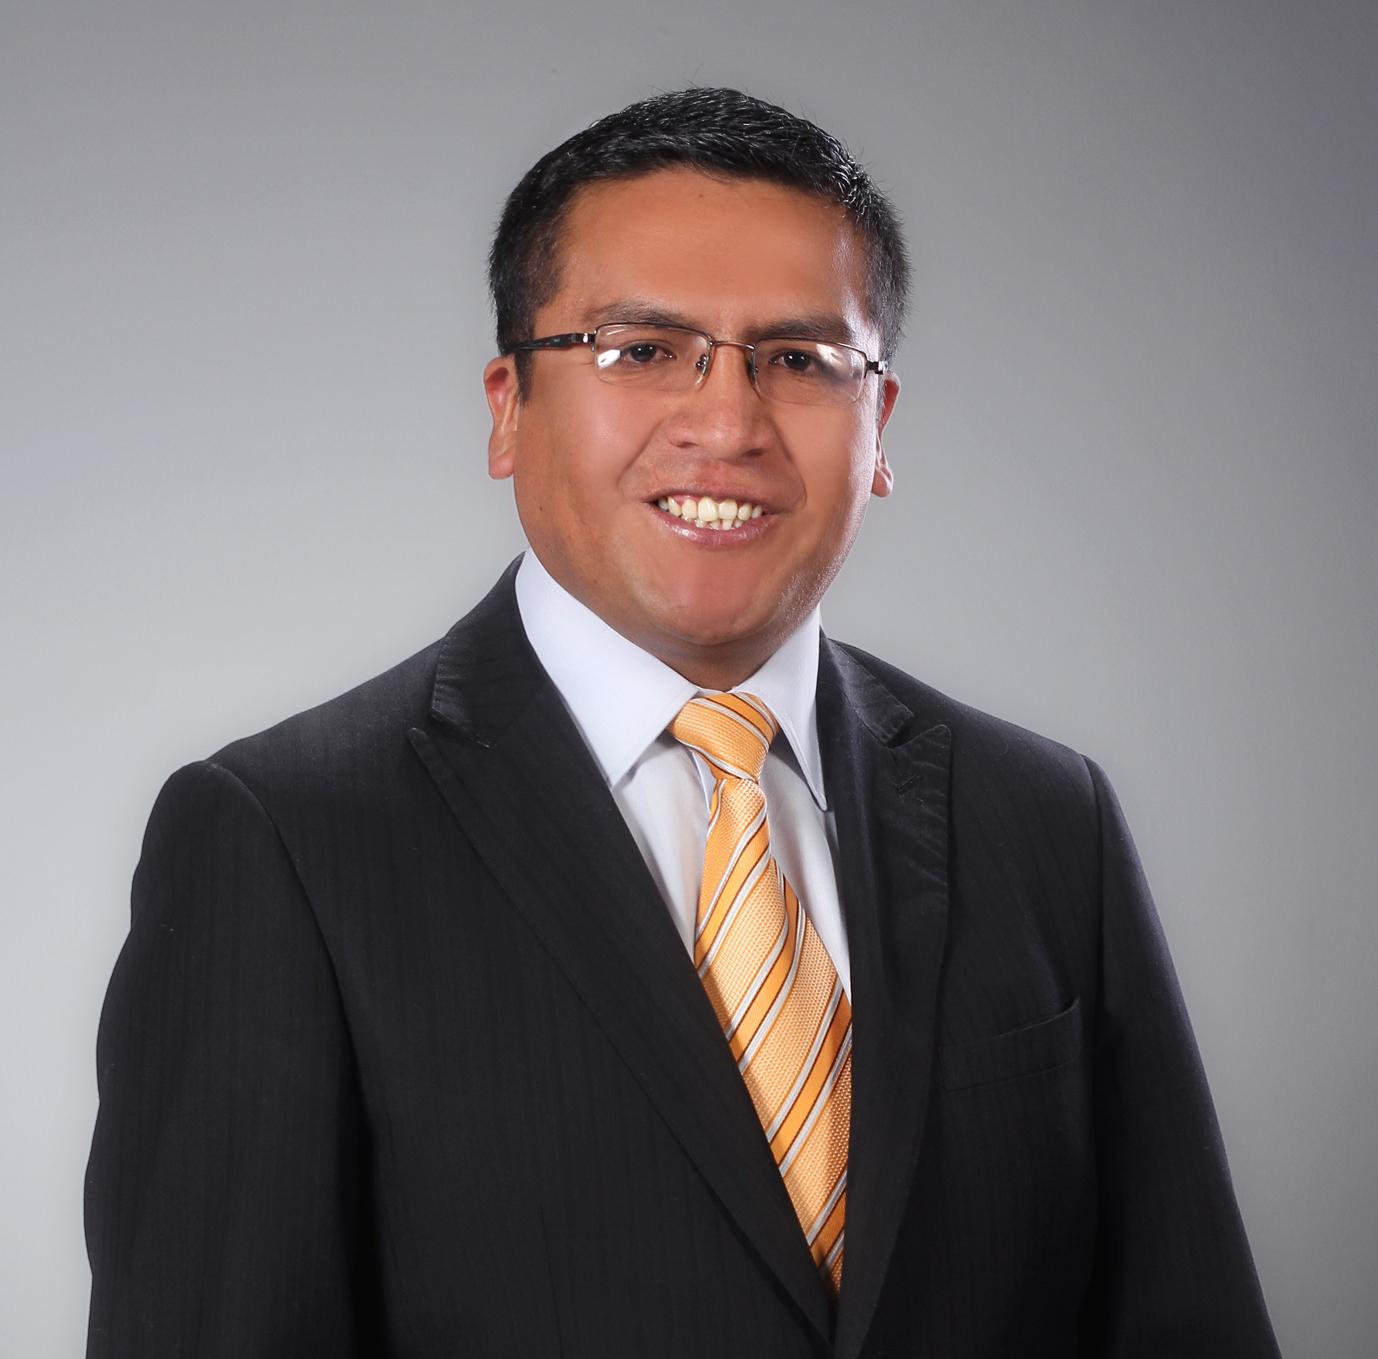 Orlando López Alarcón